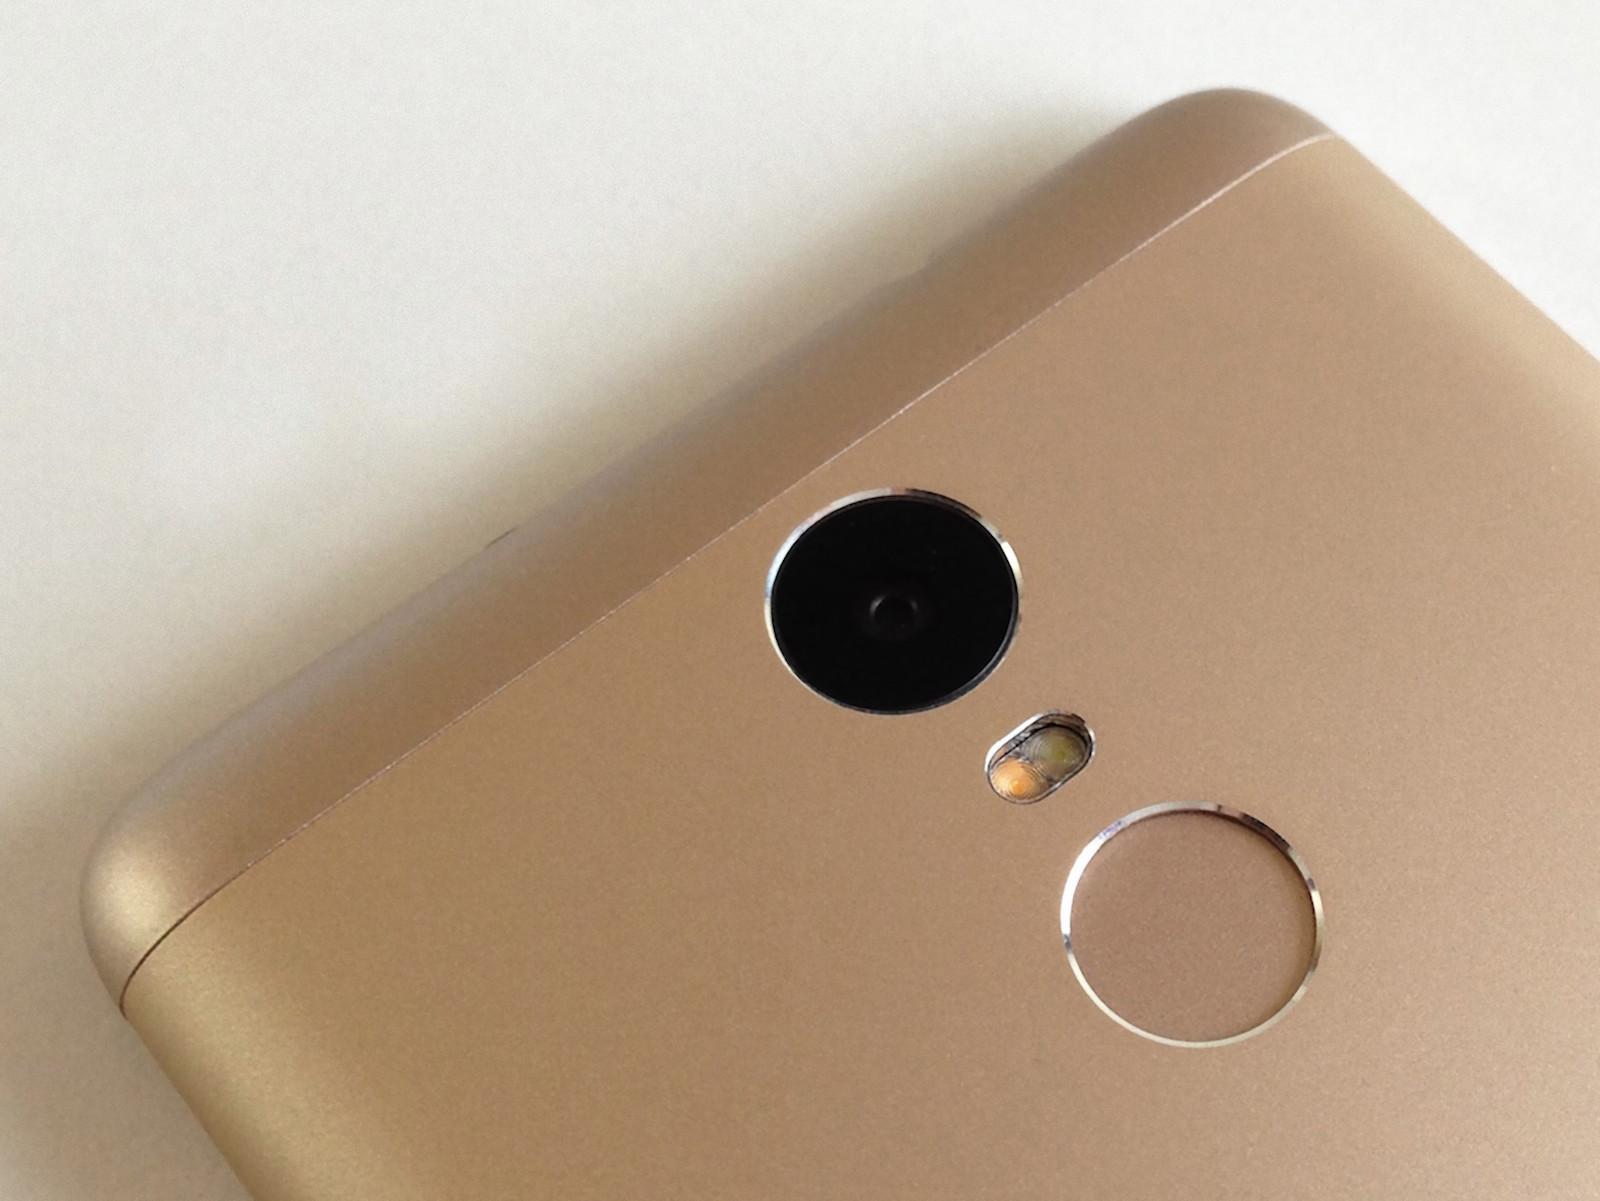 xiaomi-redmi-note-3-pro-review-camera